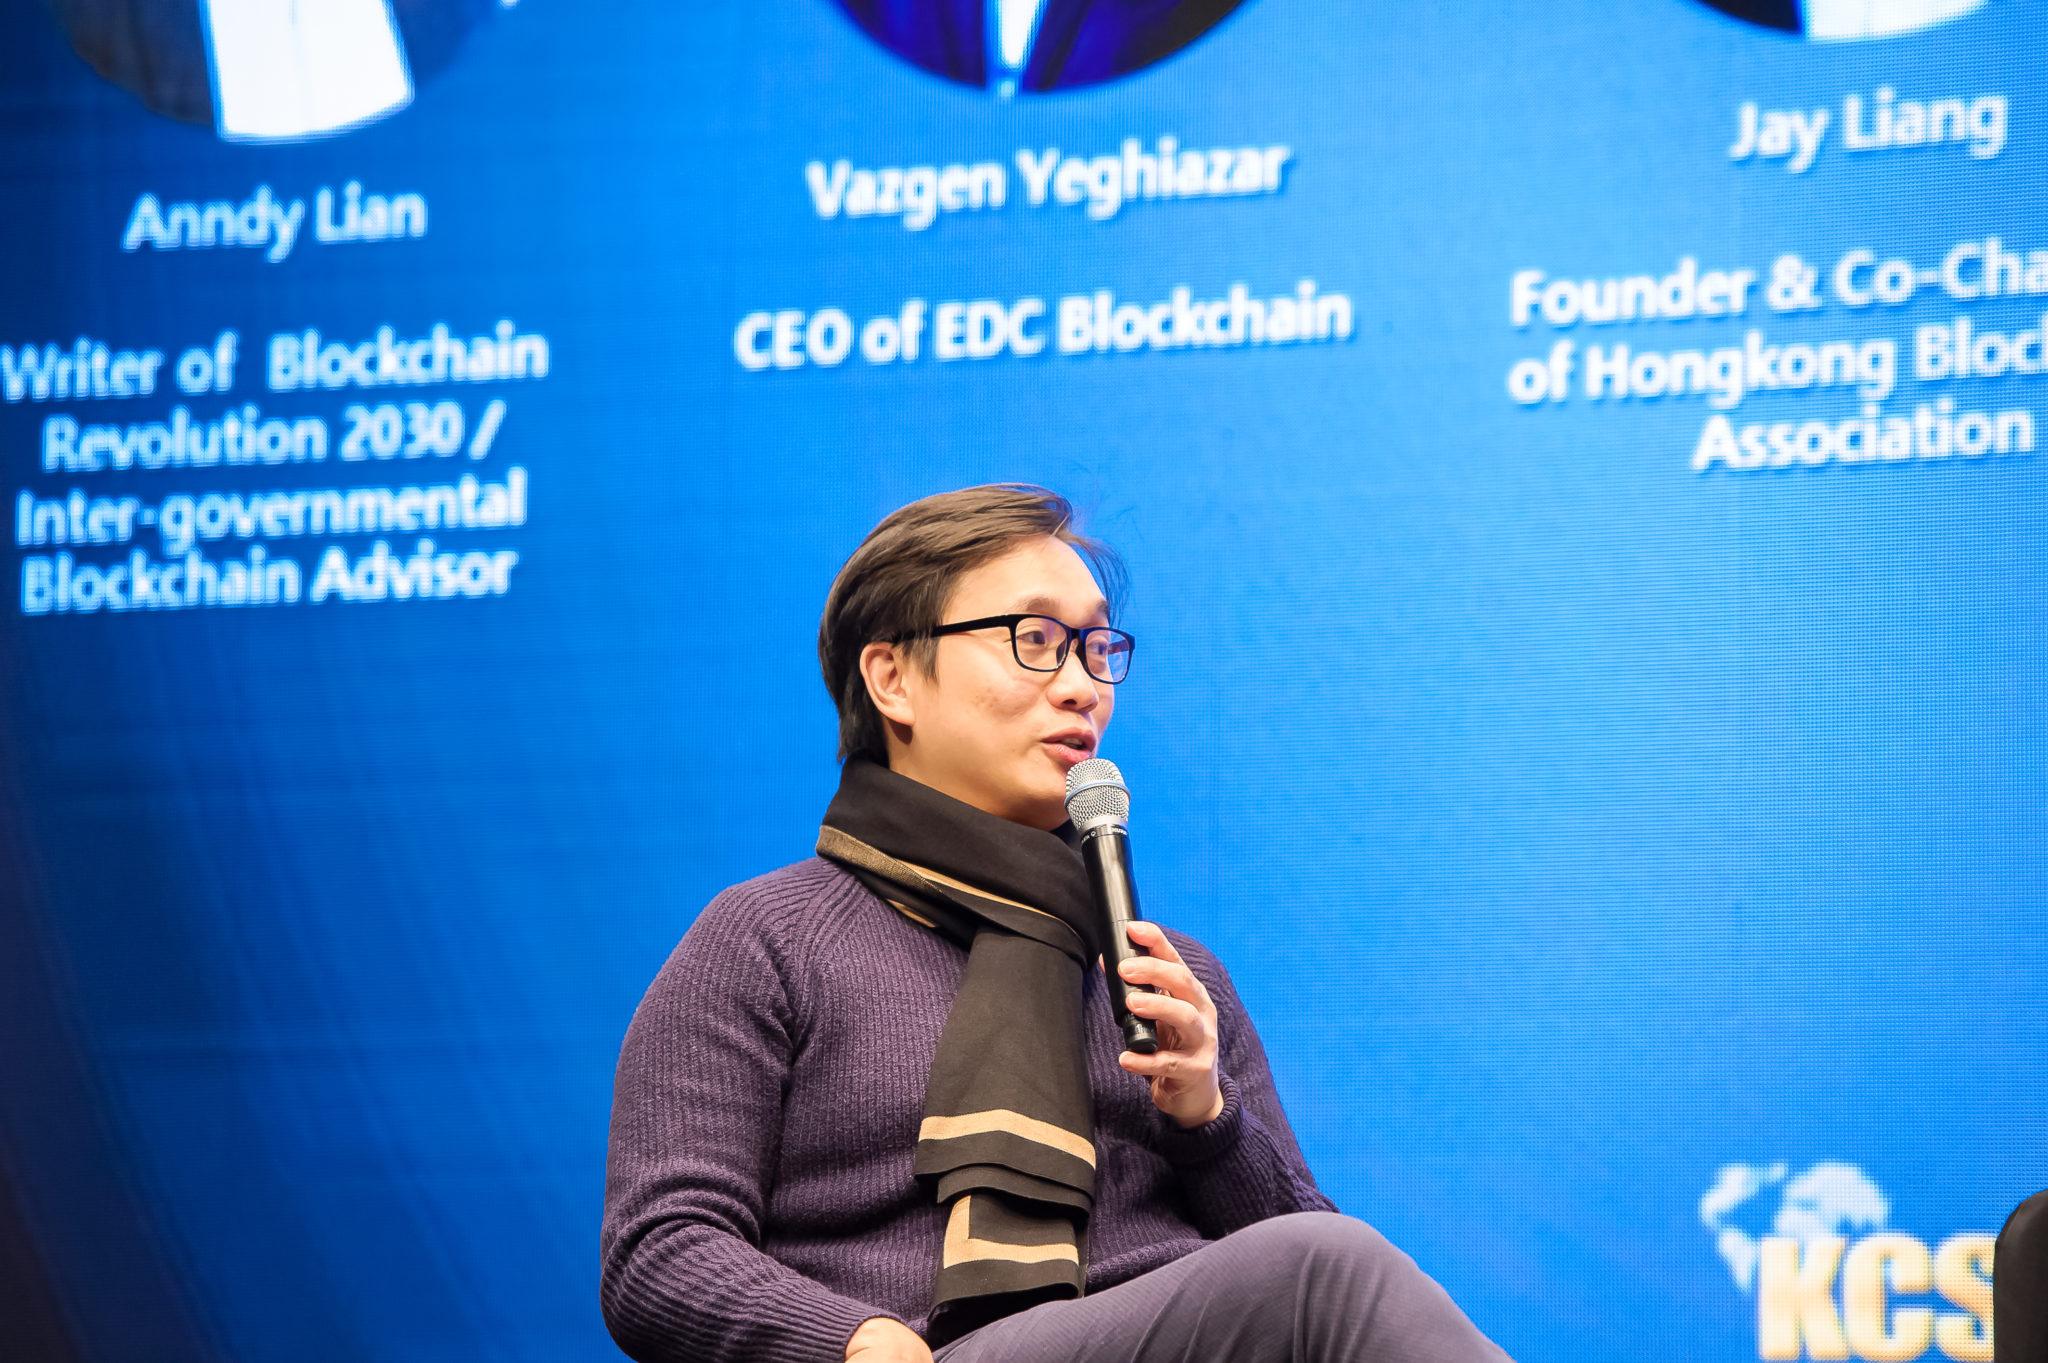 , Be In News Korea: 전문가들이 바라본 블록체인의 미래는?, Blockchain Adviser for Inter-Governmental Organisation | Book Author | Investor | Board Member